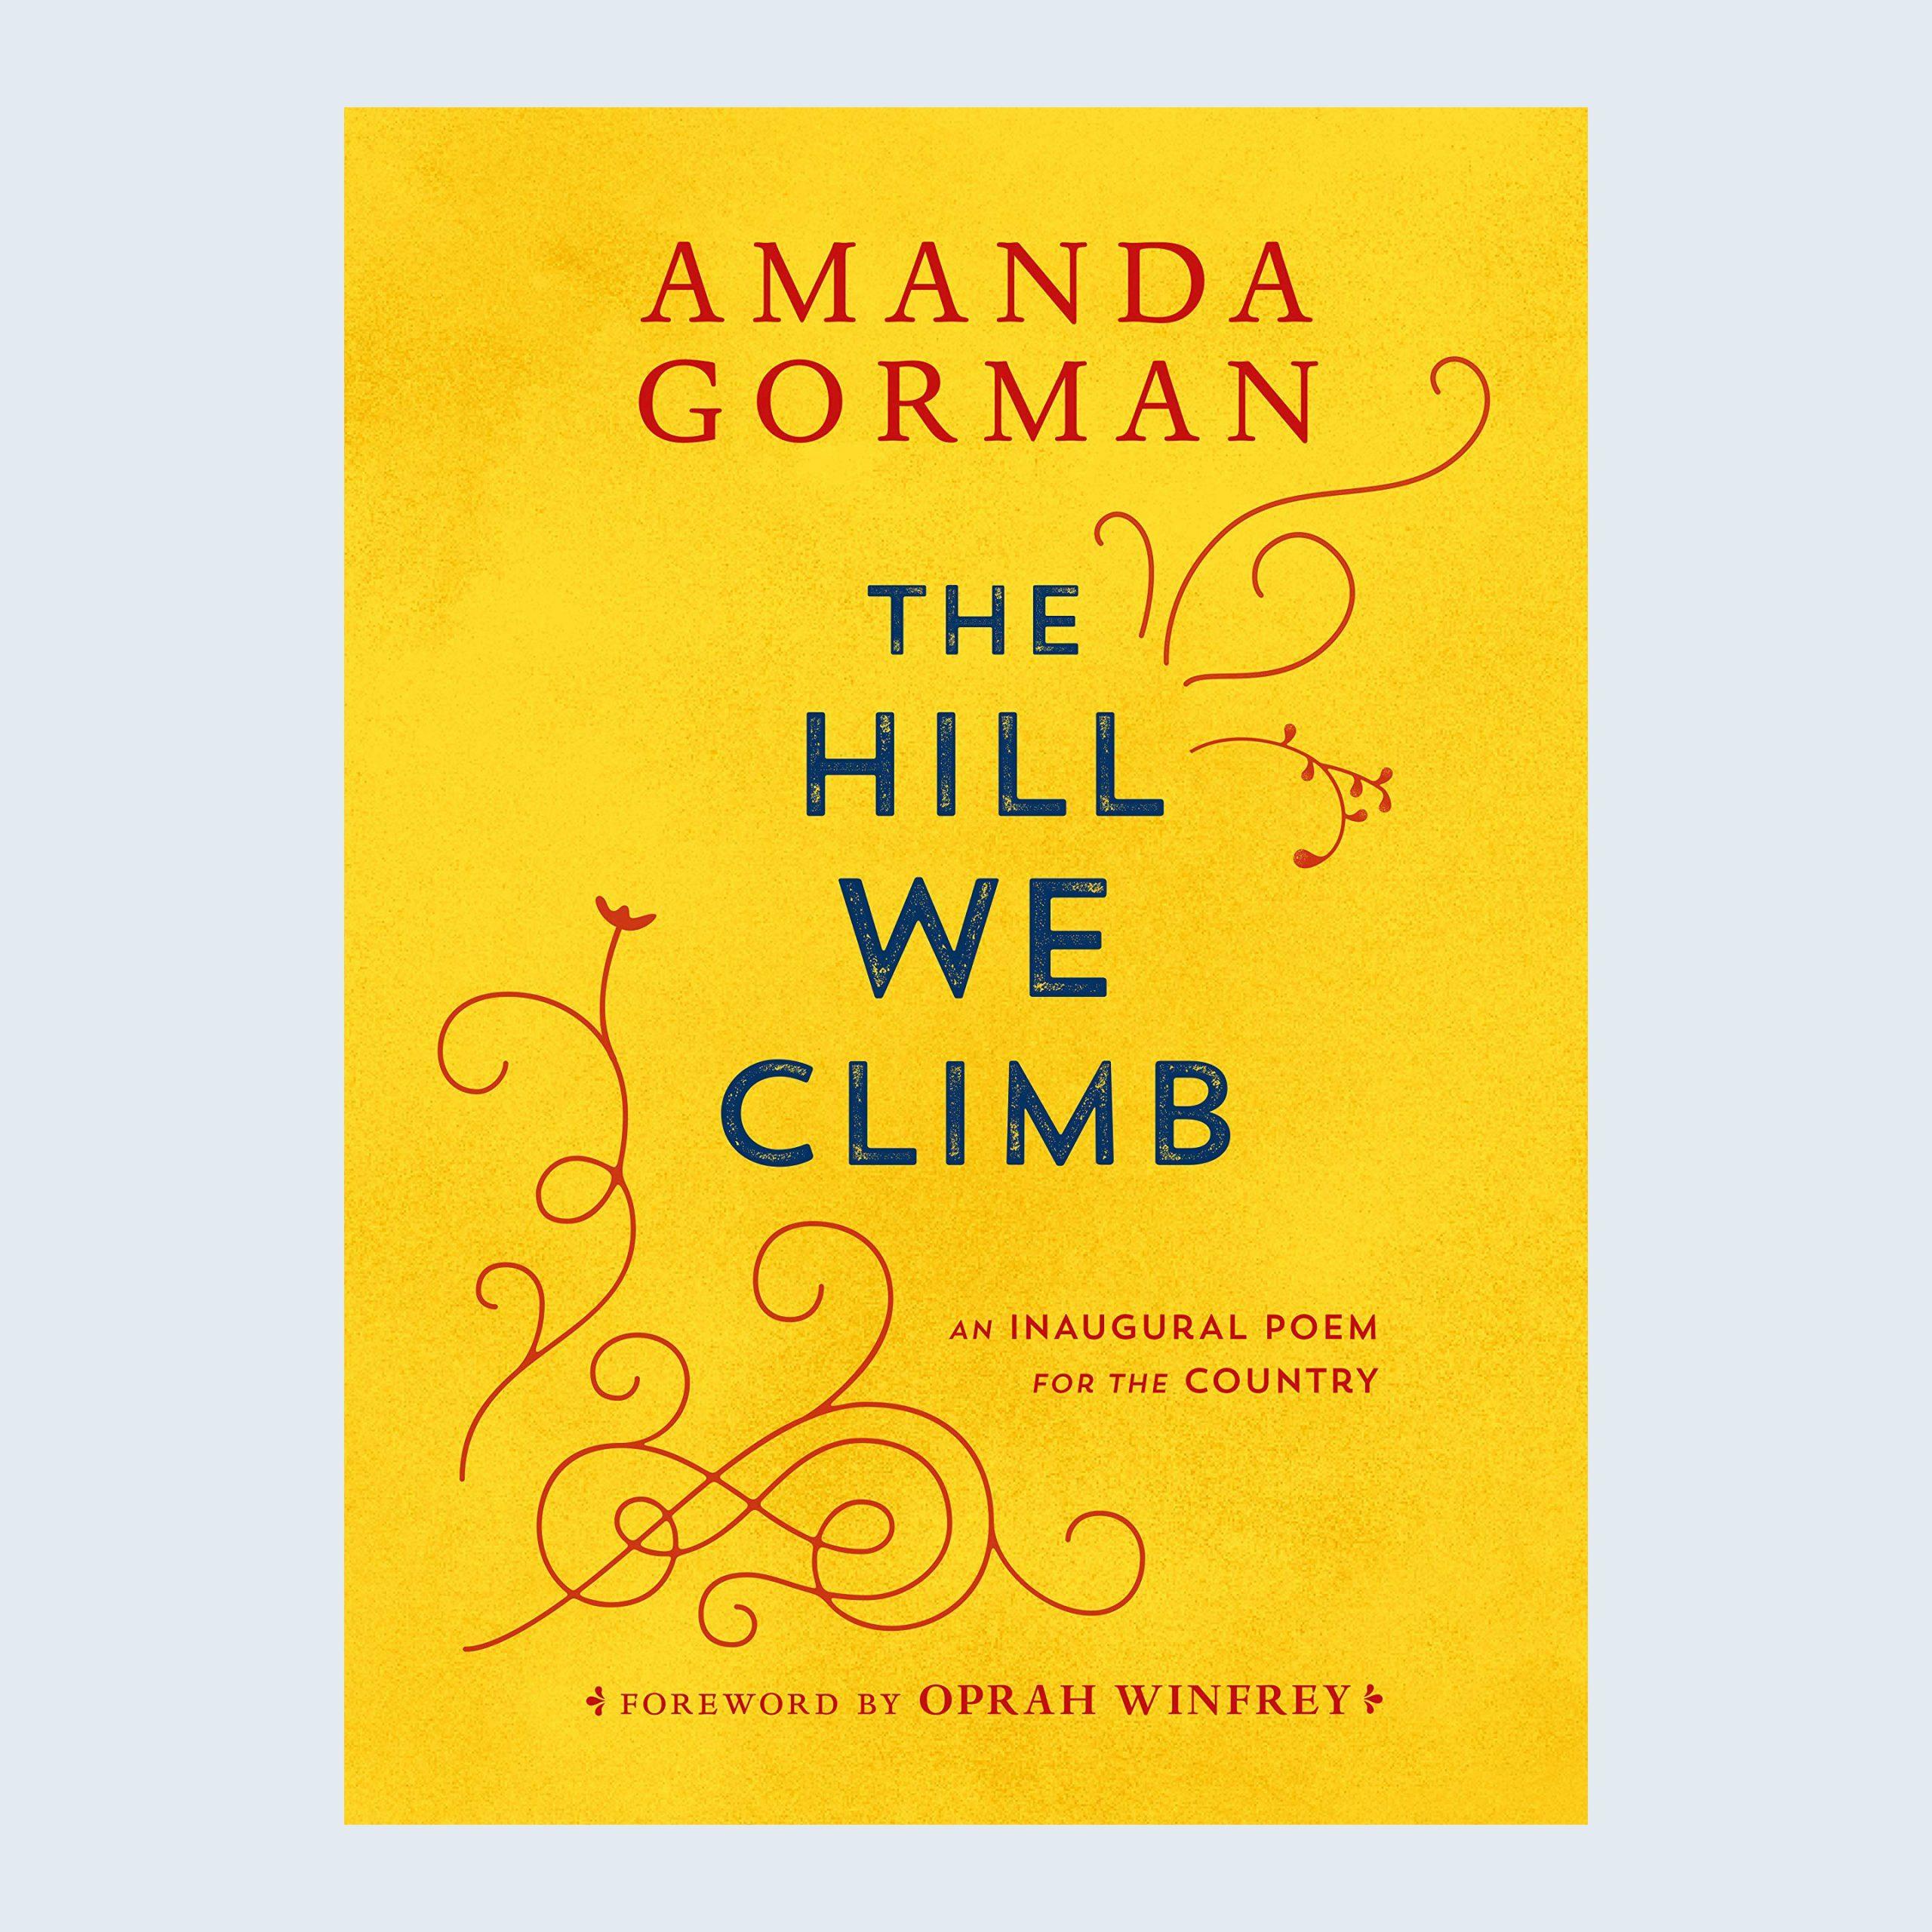 Amanda Gorman's The Hill We Climb